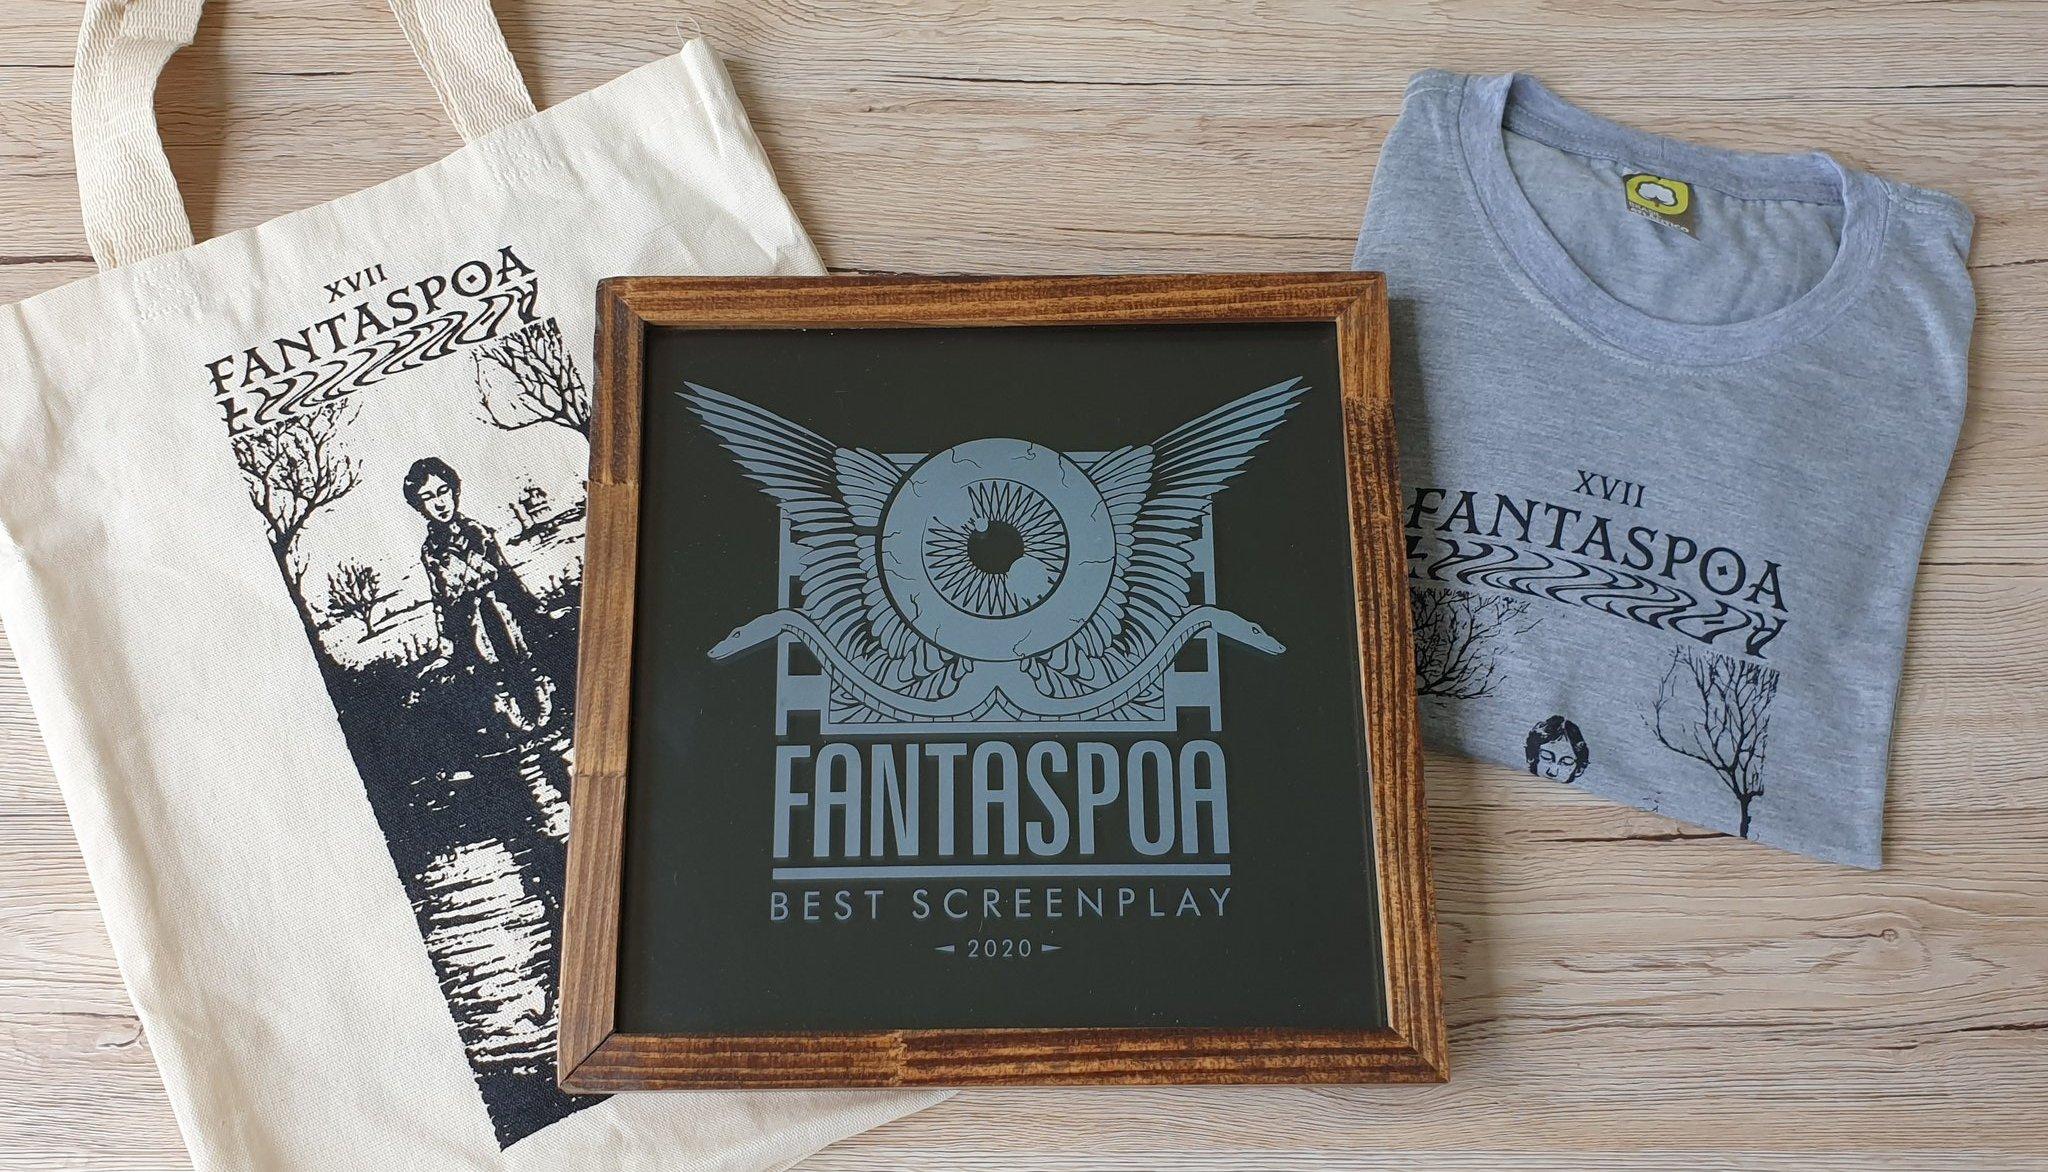 fantaspoa 2020 best screenplay paketti